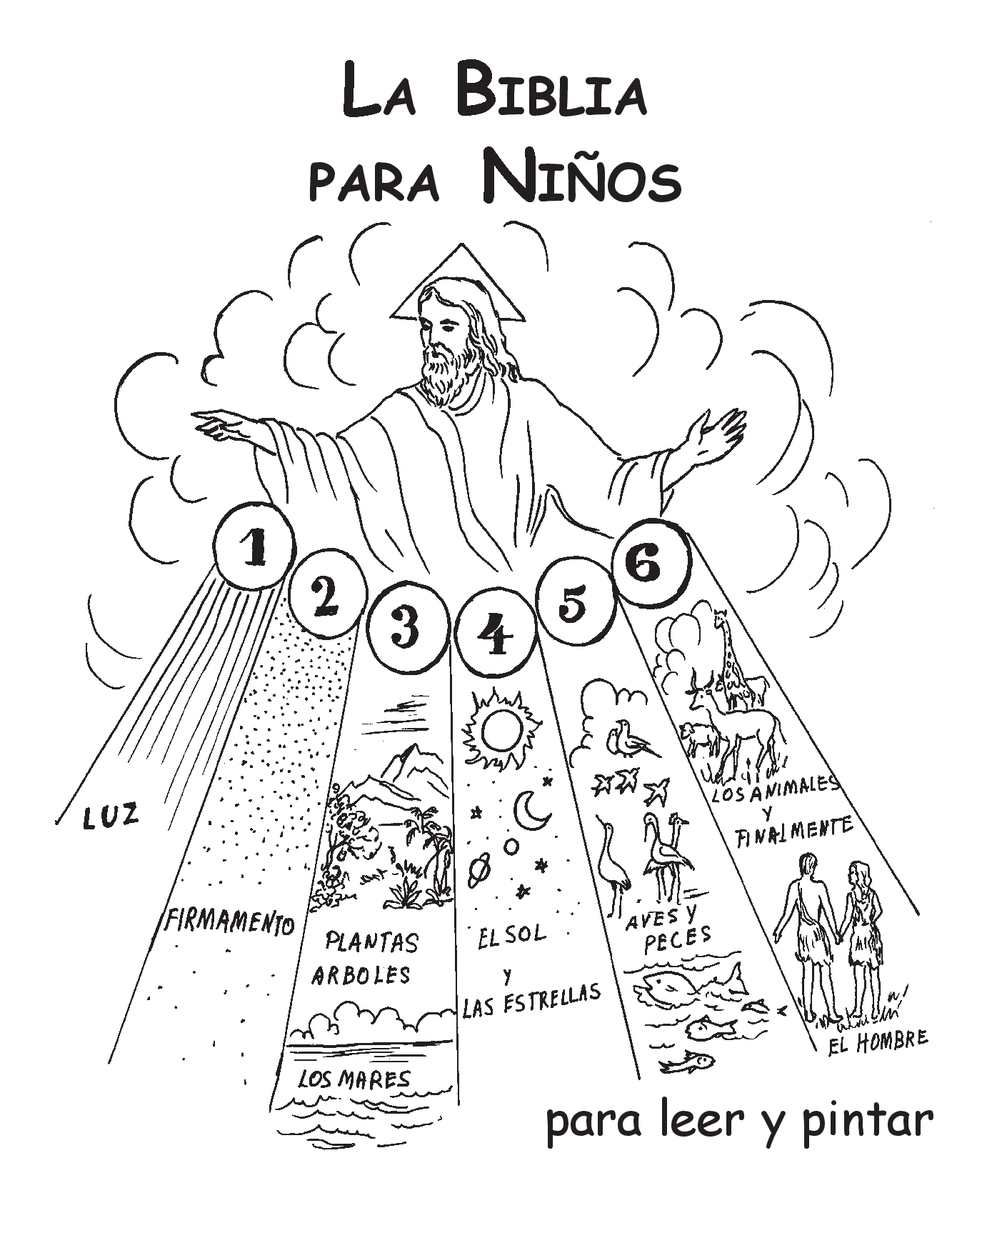 La Biblia Para Ninios Historias De La Biblia Para Ninos Biblia Para Ninos Biblia Catolica Para Ninos